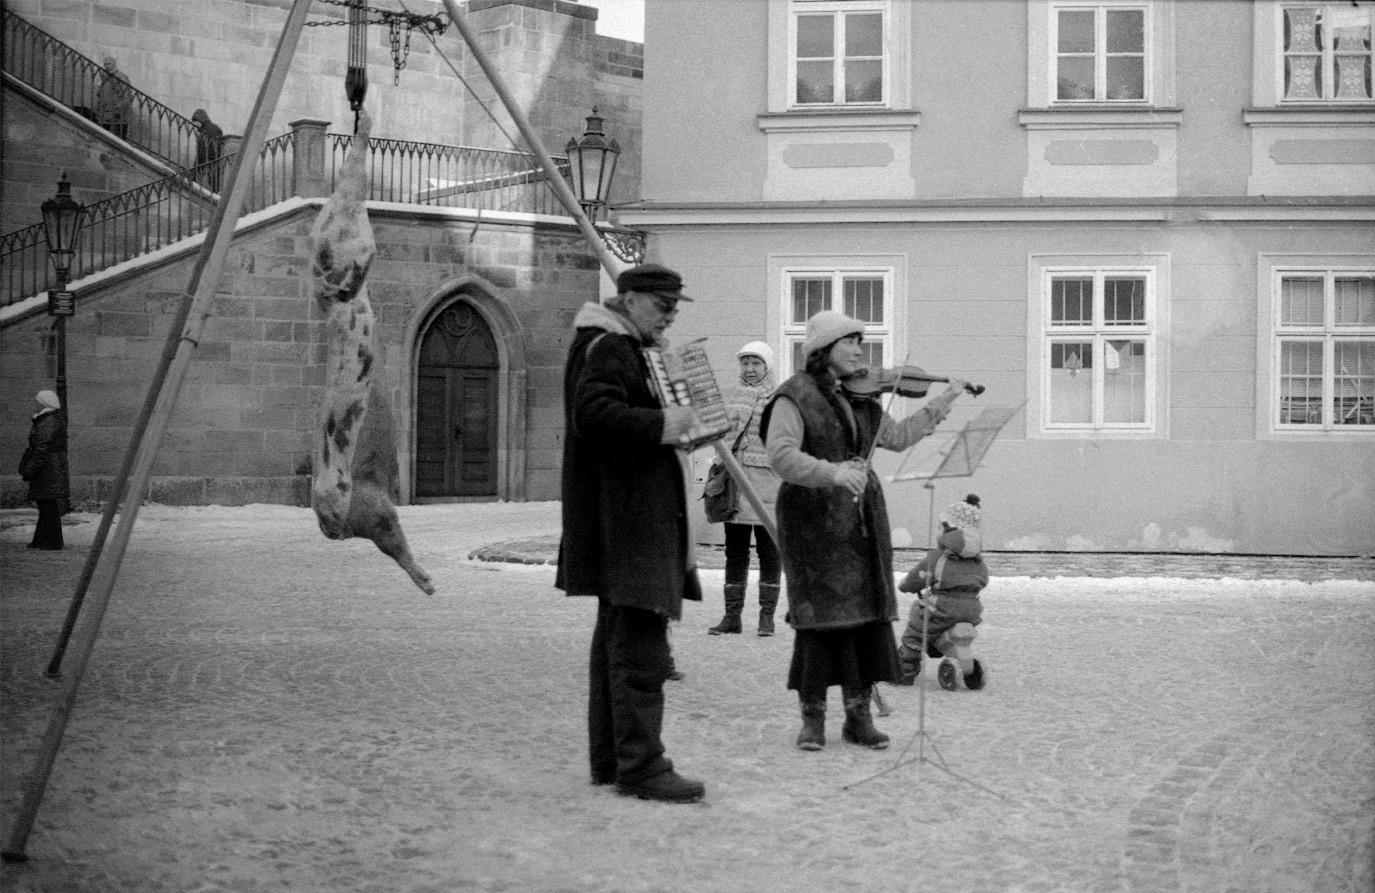 Street performers in Prague, Czech Republic. 2012